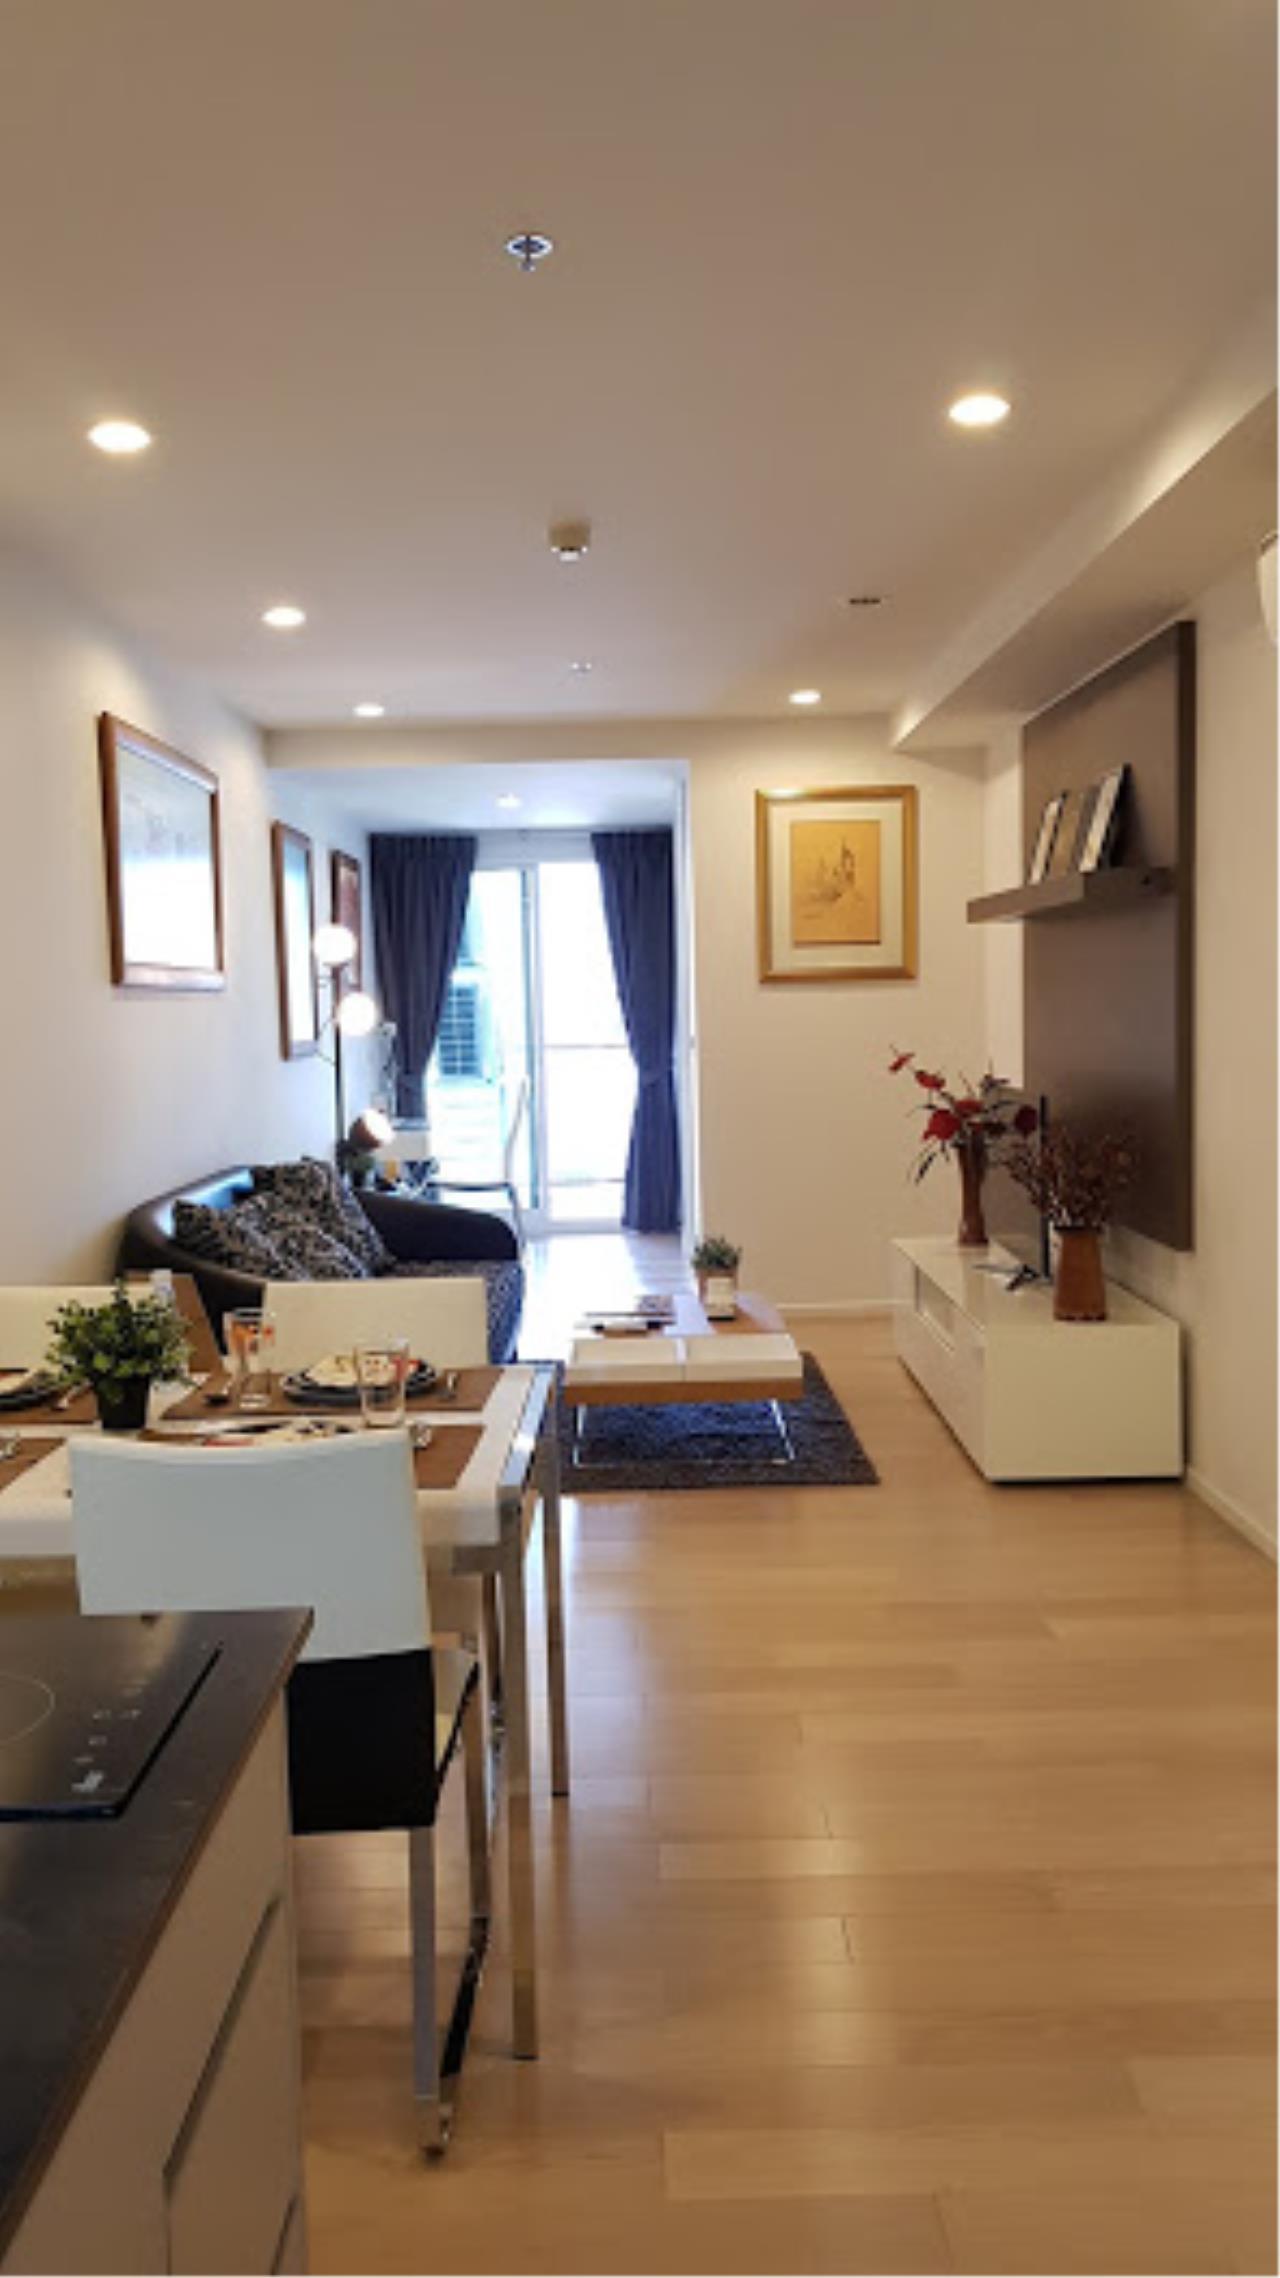 Quality Life Property Agency's S A L E & R E N T ! 15 Sukhumvit Residence | 1 BED 1 BATH | 59.29 SQ. M. 10